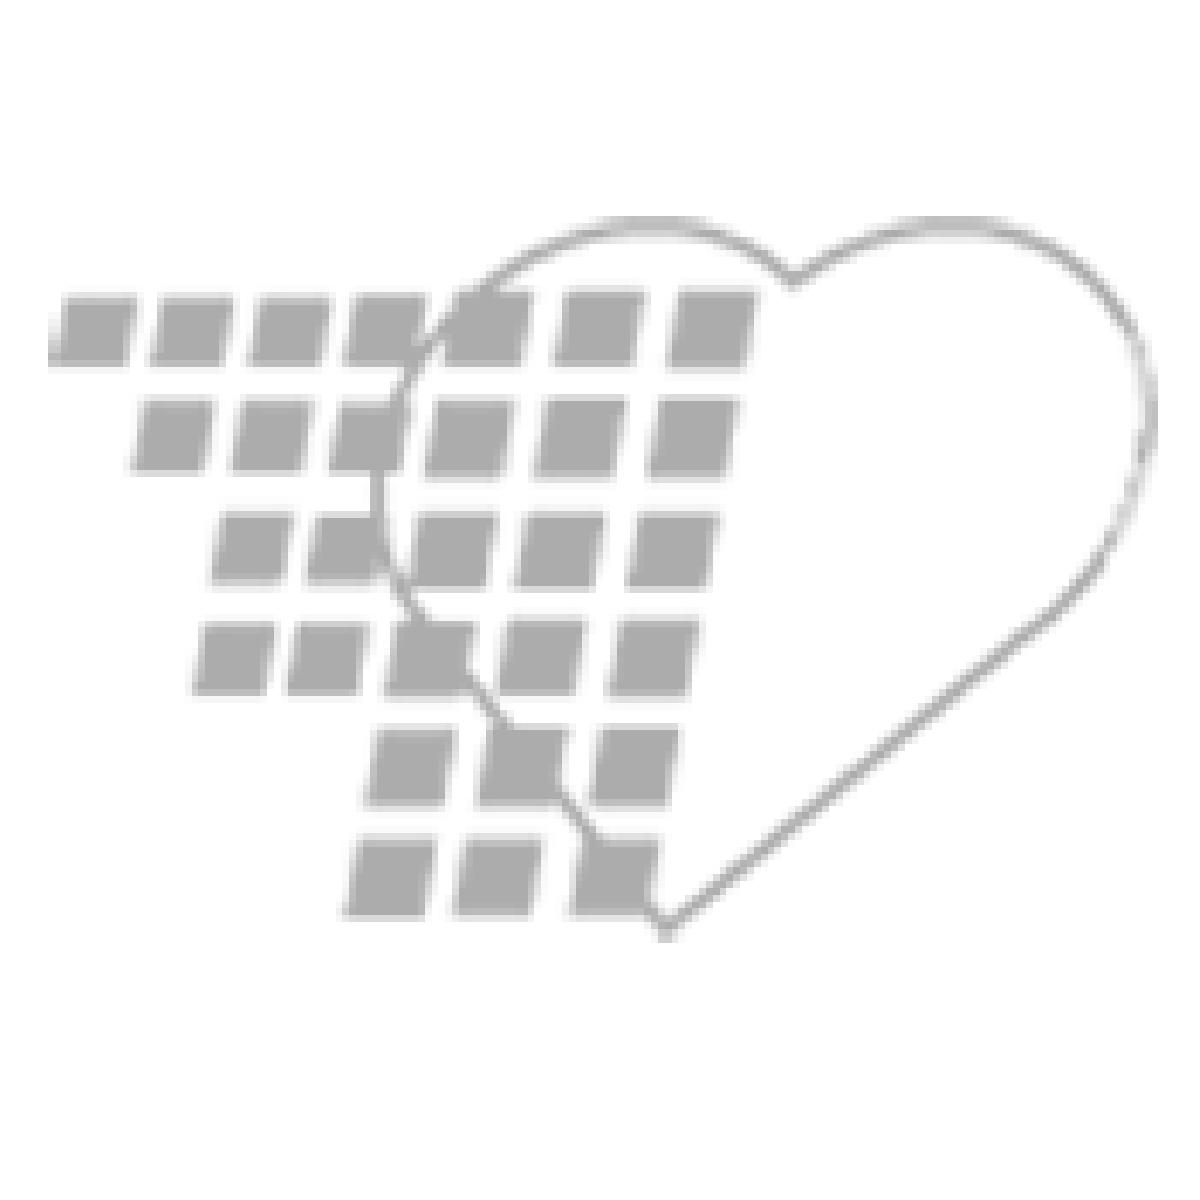 09-09-9762 Basic Nursing and Nurse Aide Training 5 DVD Series